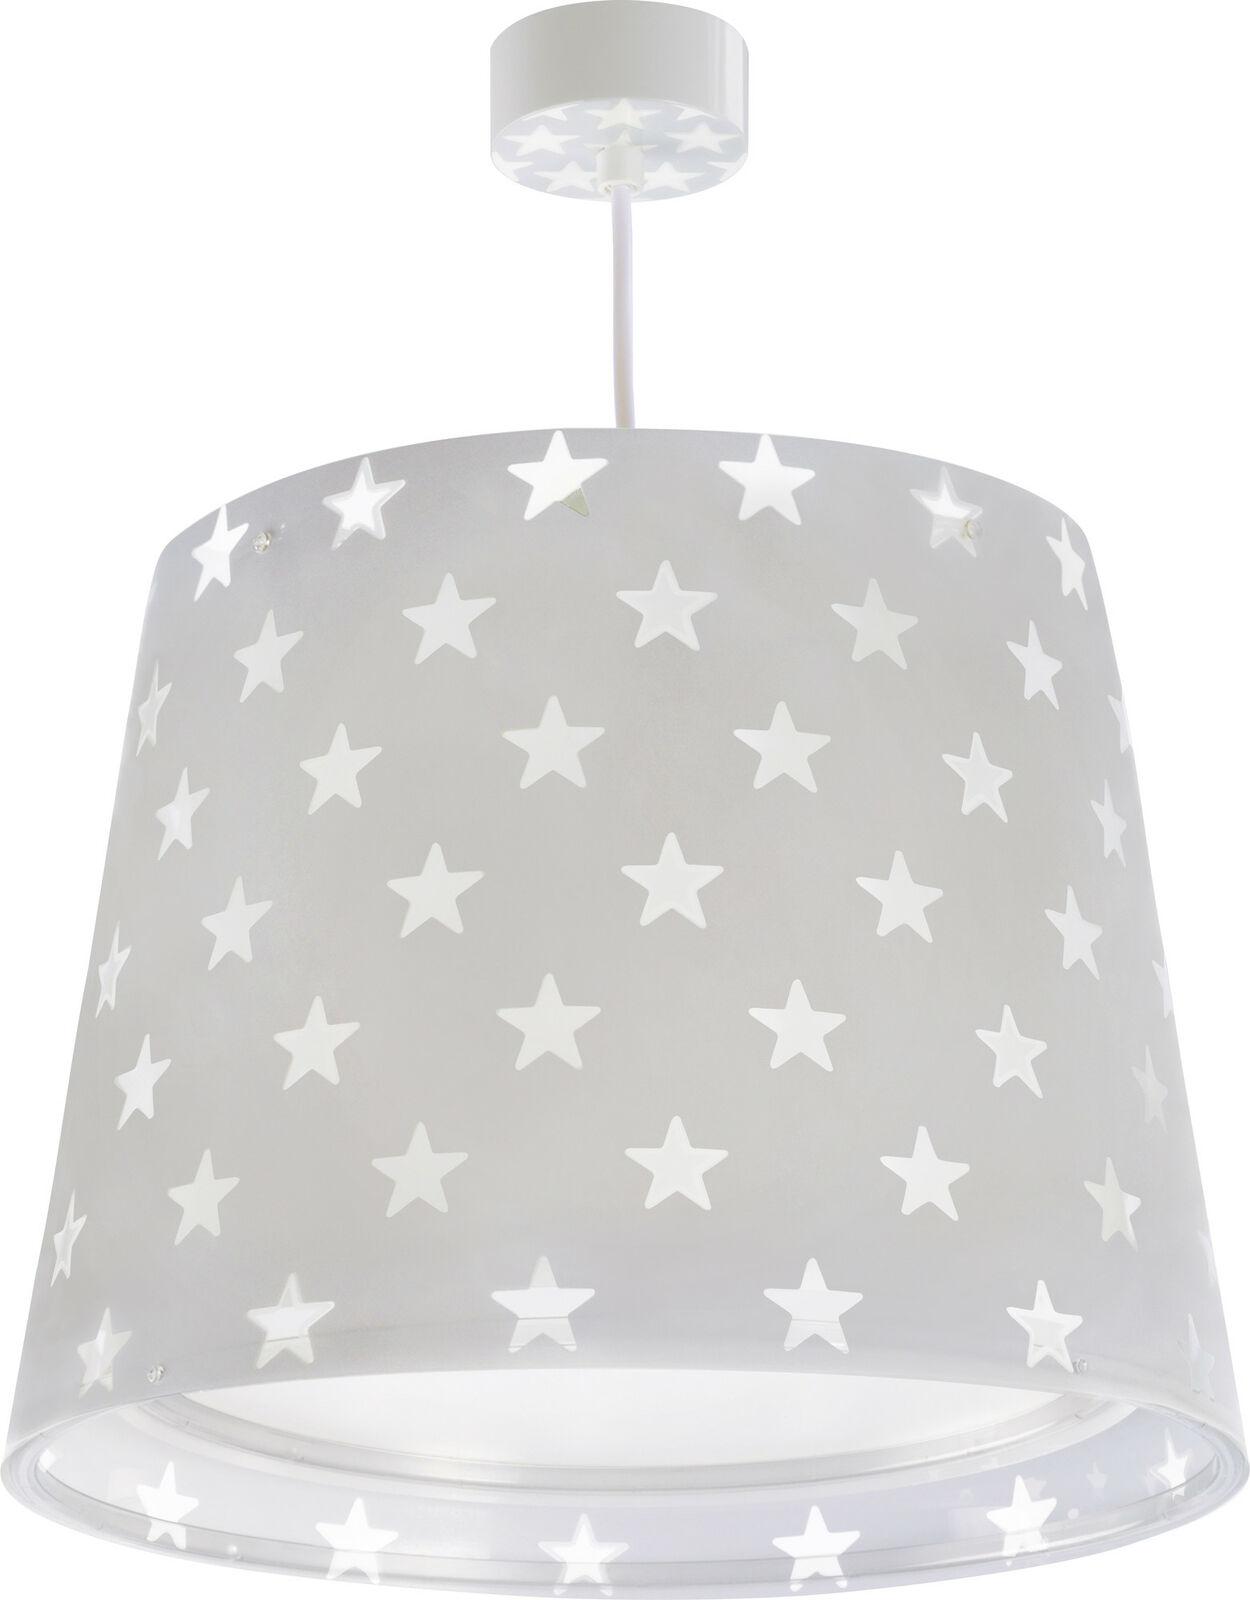 Kinderzimmer-Lampe  Mädchen & Jungen 81212E Sterne Hänge-Lampe  grau